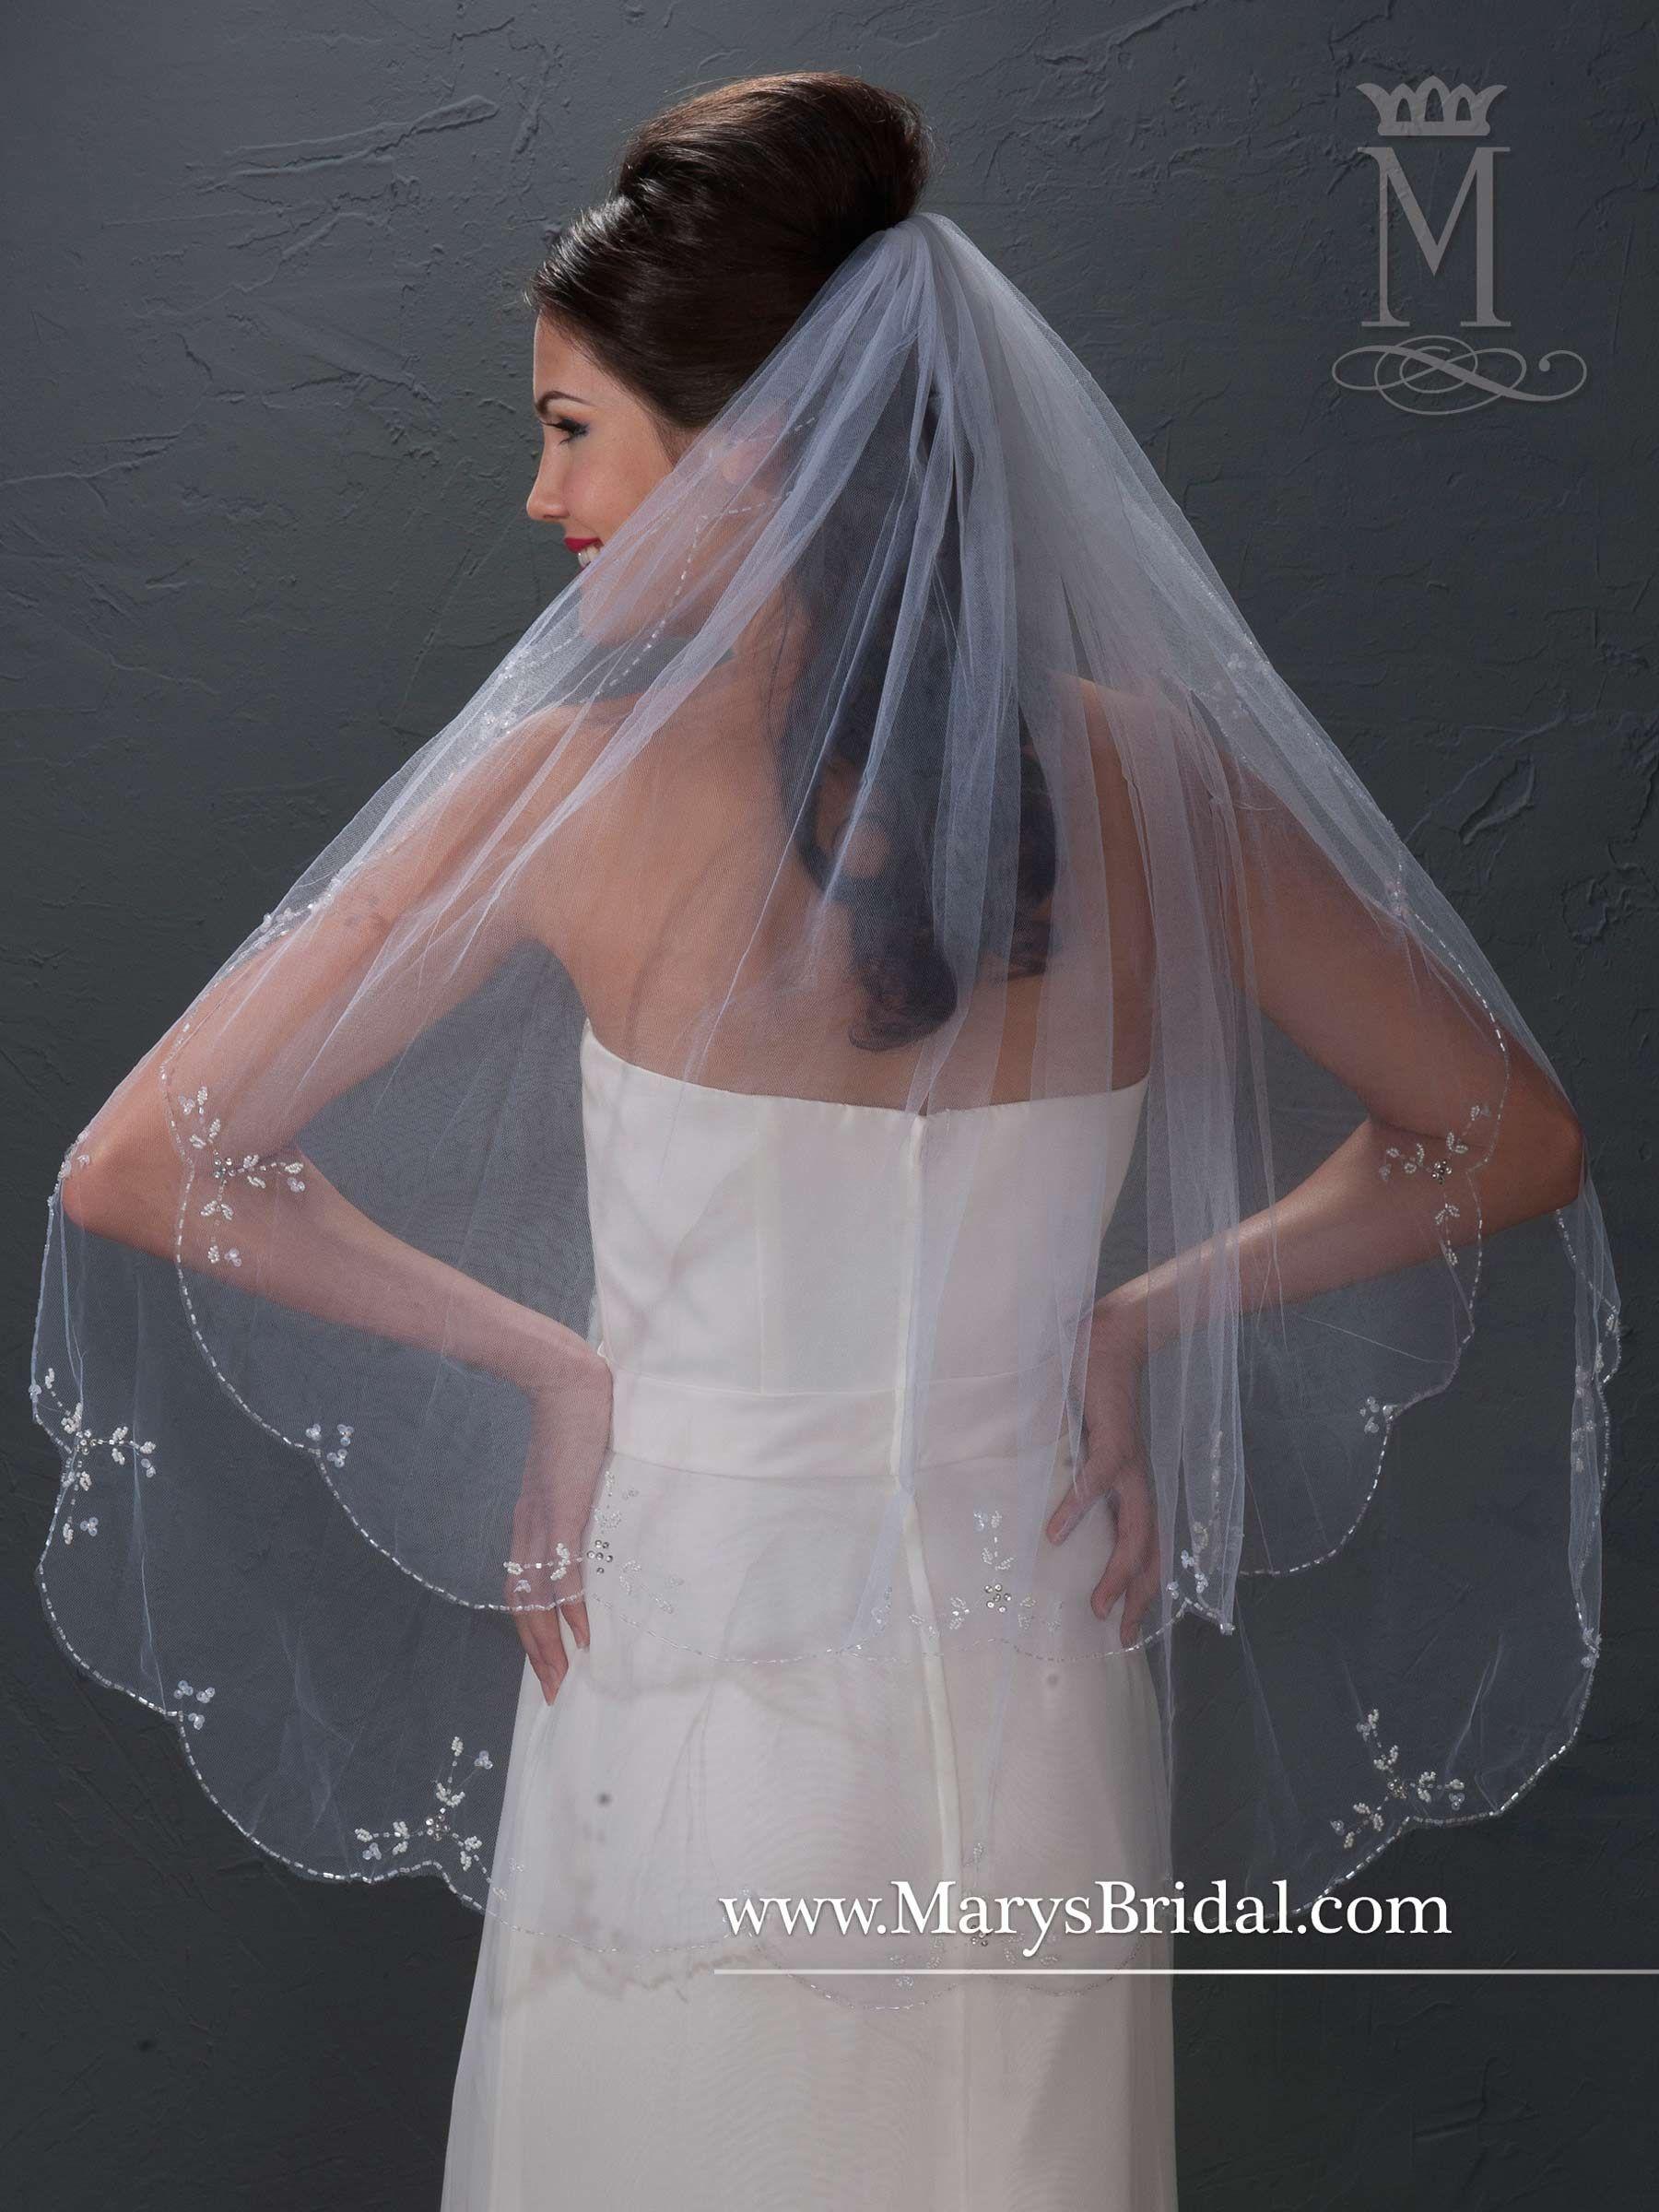 Pin by sabrina alison on wedding ideas pinterest wedding dress